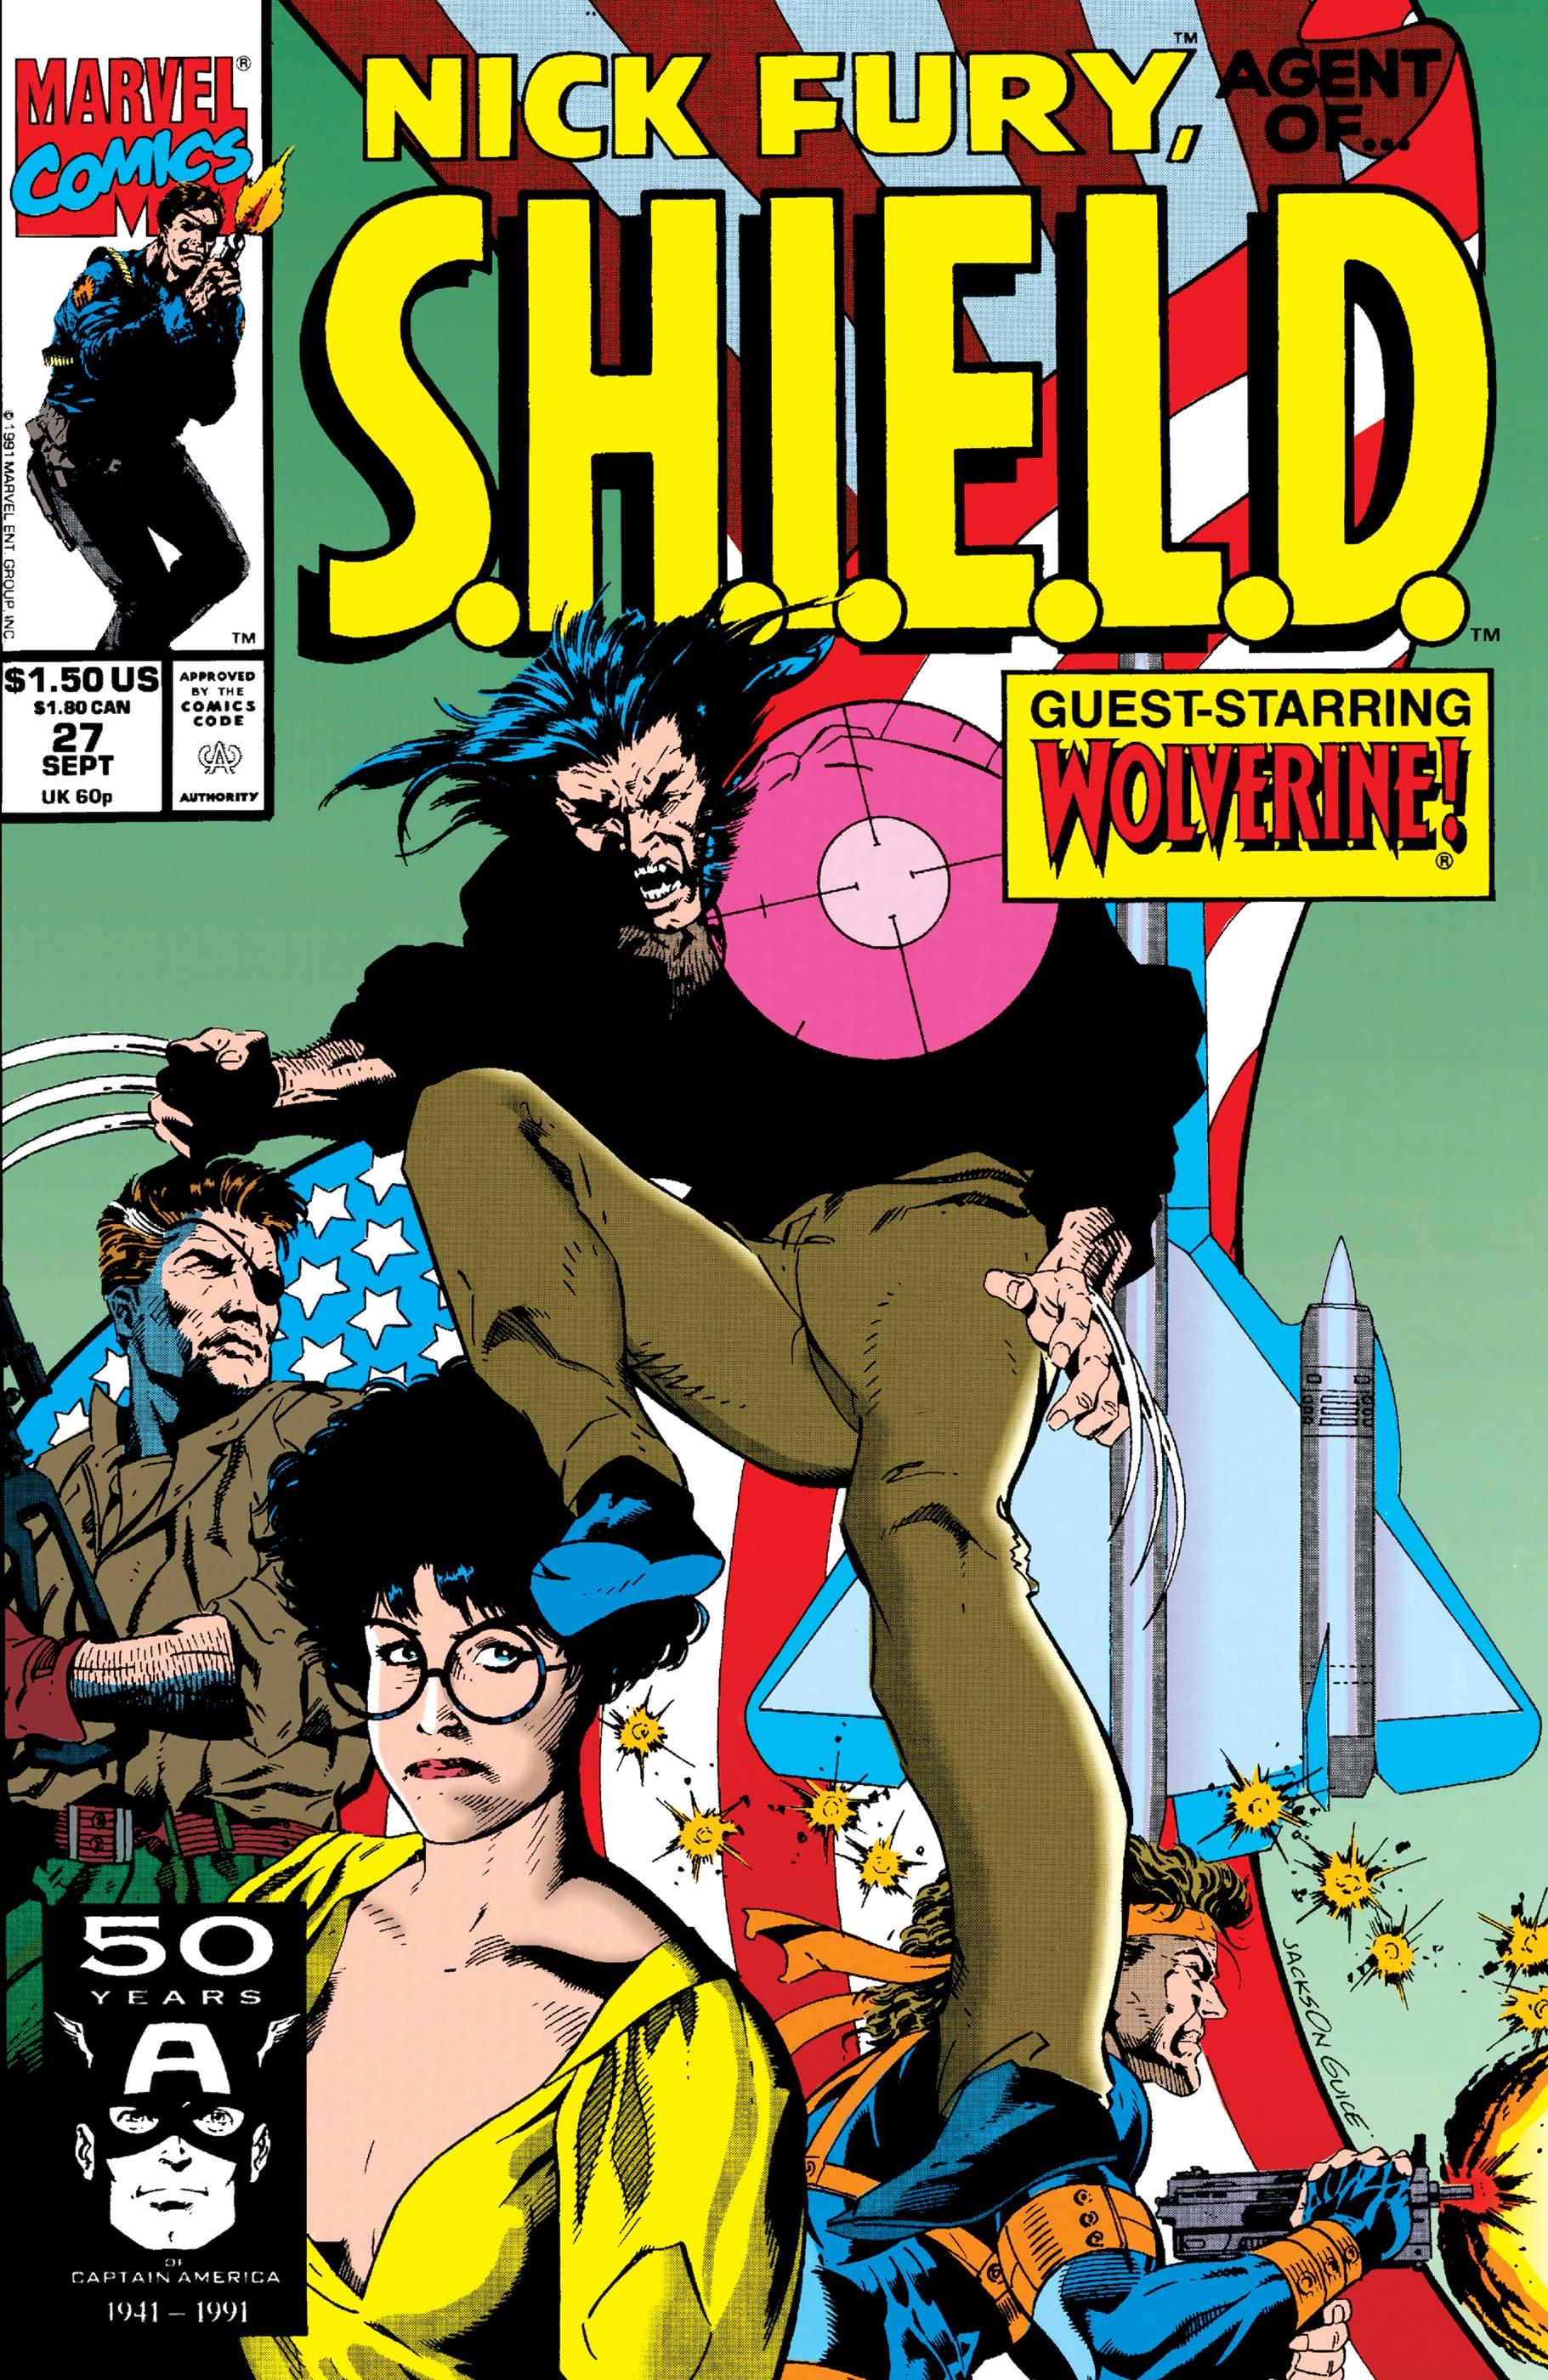 Nick Fury, Agent of S.H.I.E.L.D. (1989) #27